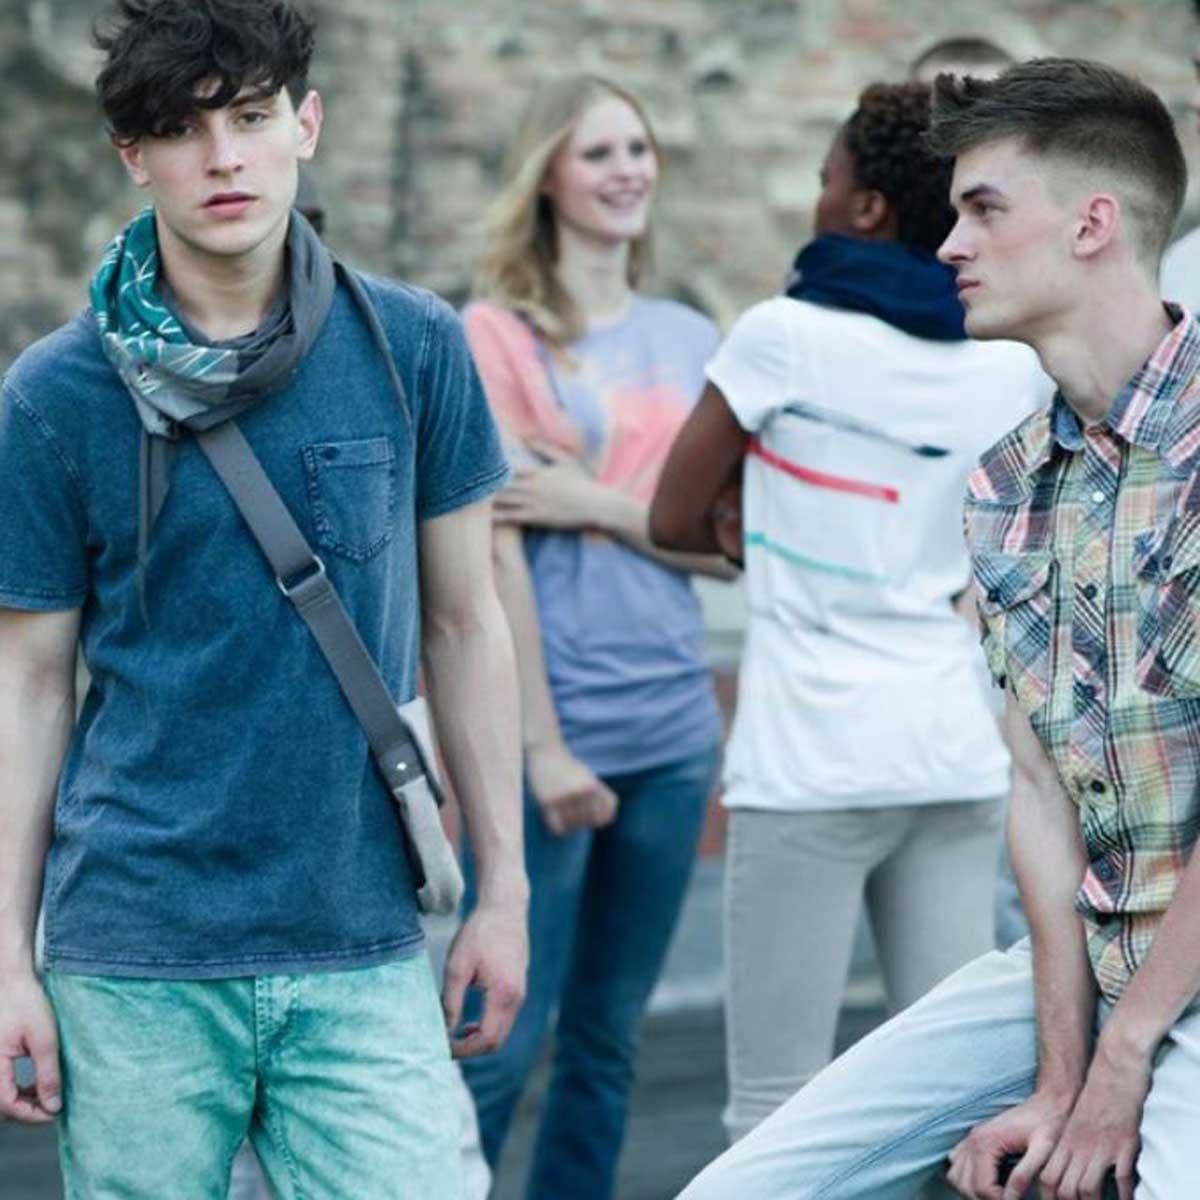 Jeanstrends Modetrends Denimwear